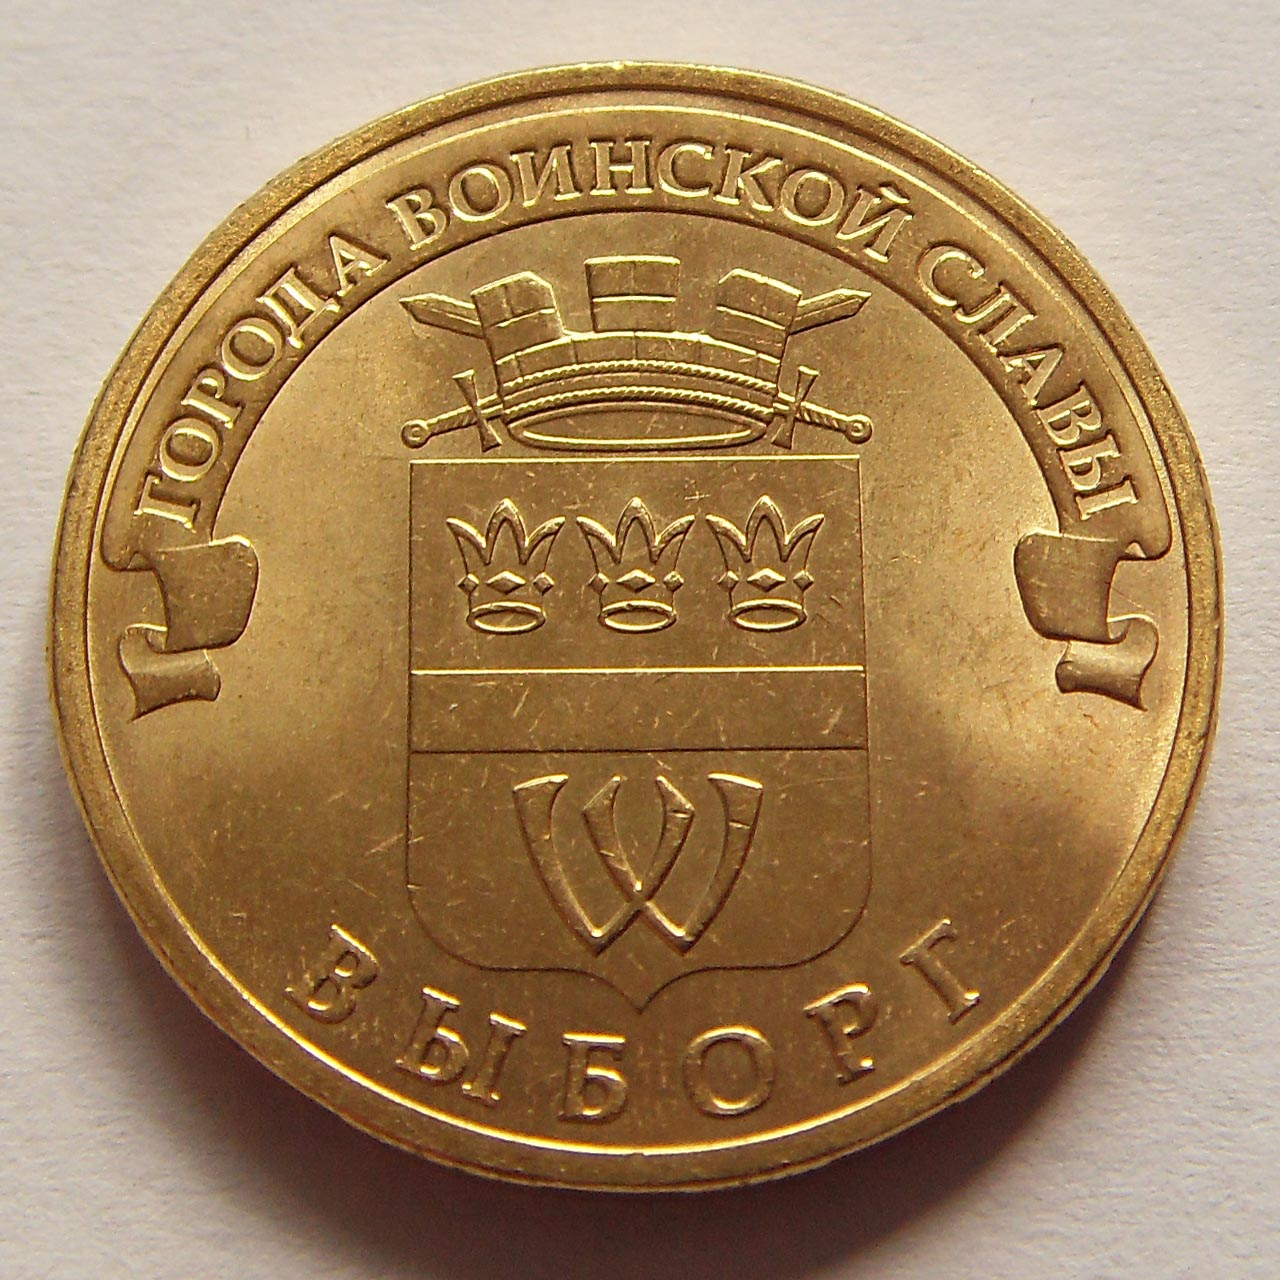 что изображено на 5 евро